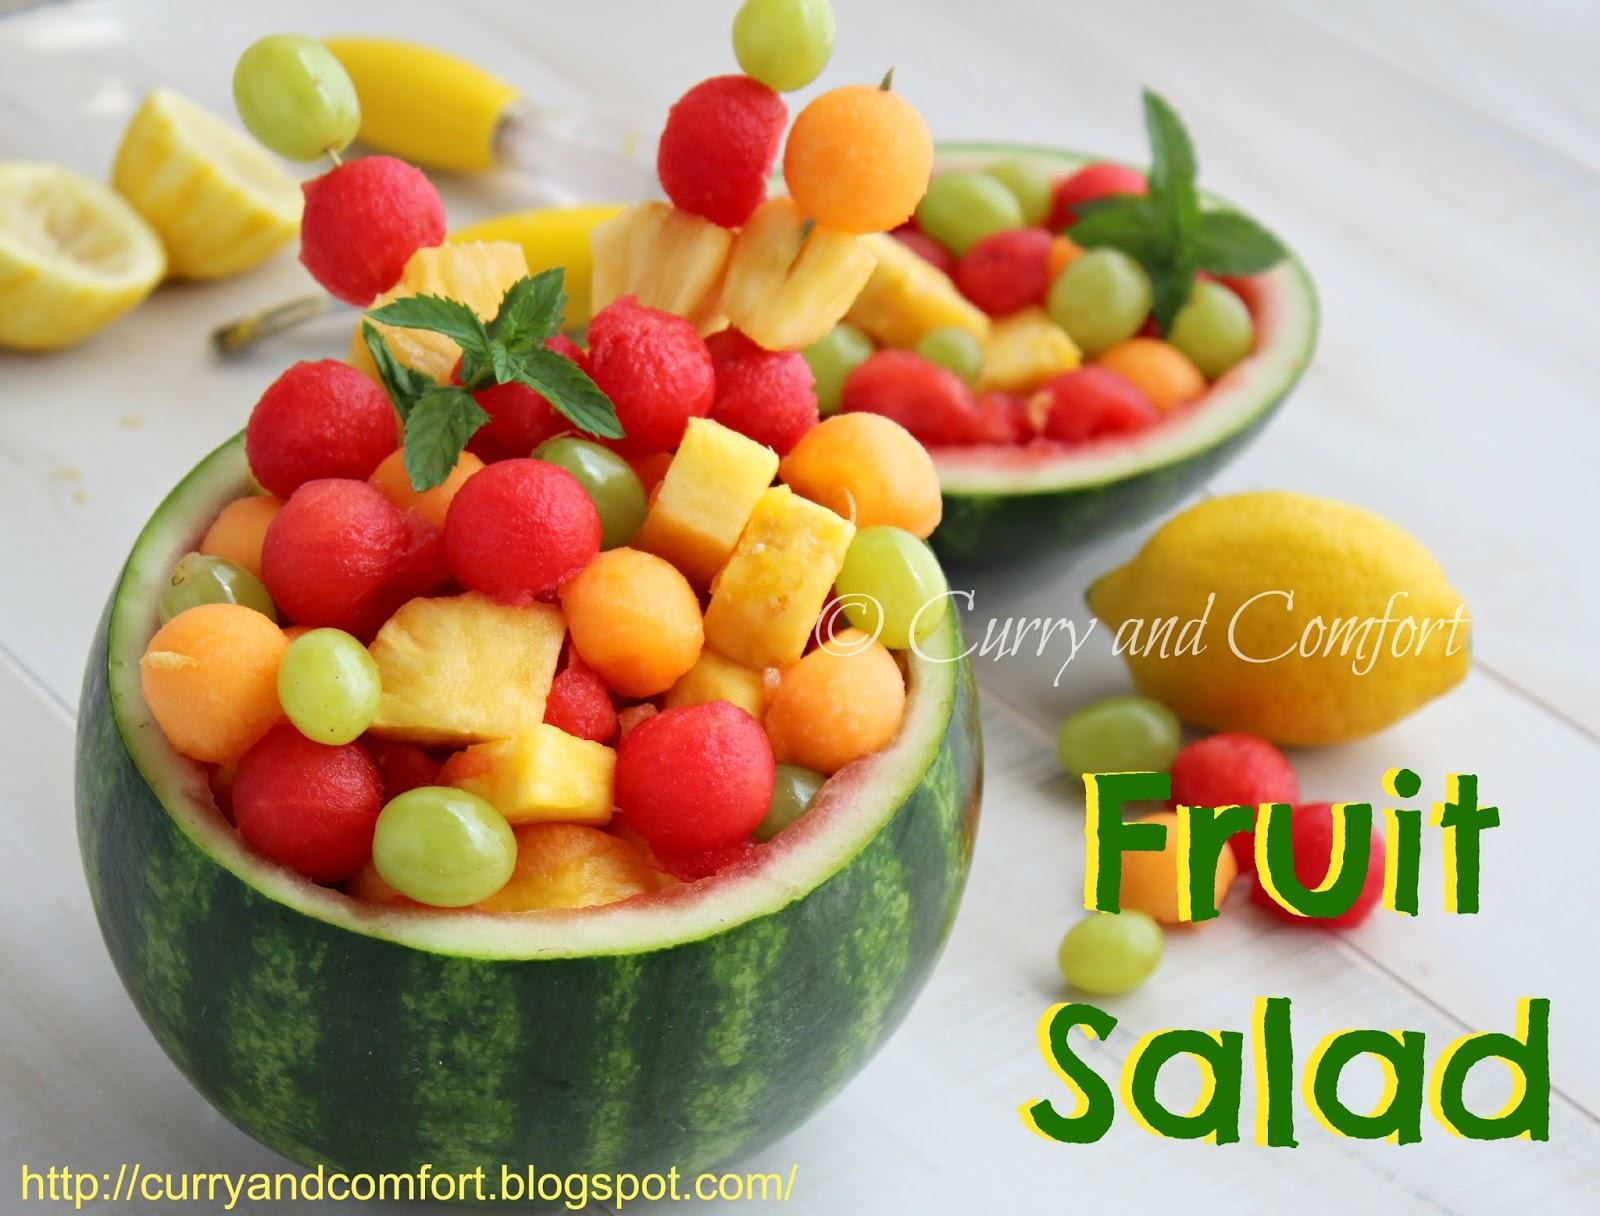 Kitchen Simmer: Fruit Salad in Watermelon Bowl